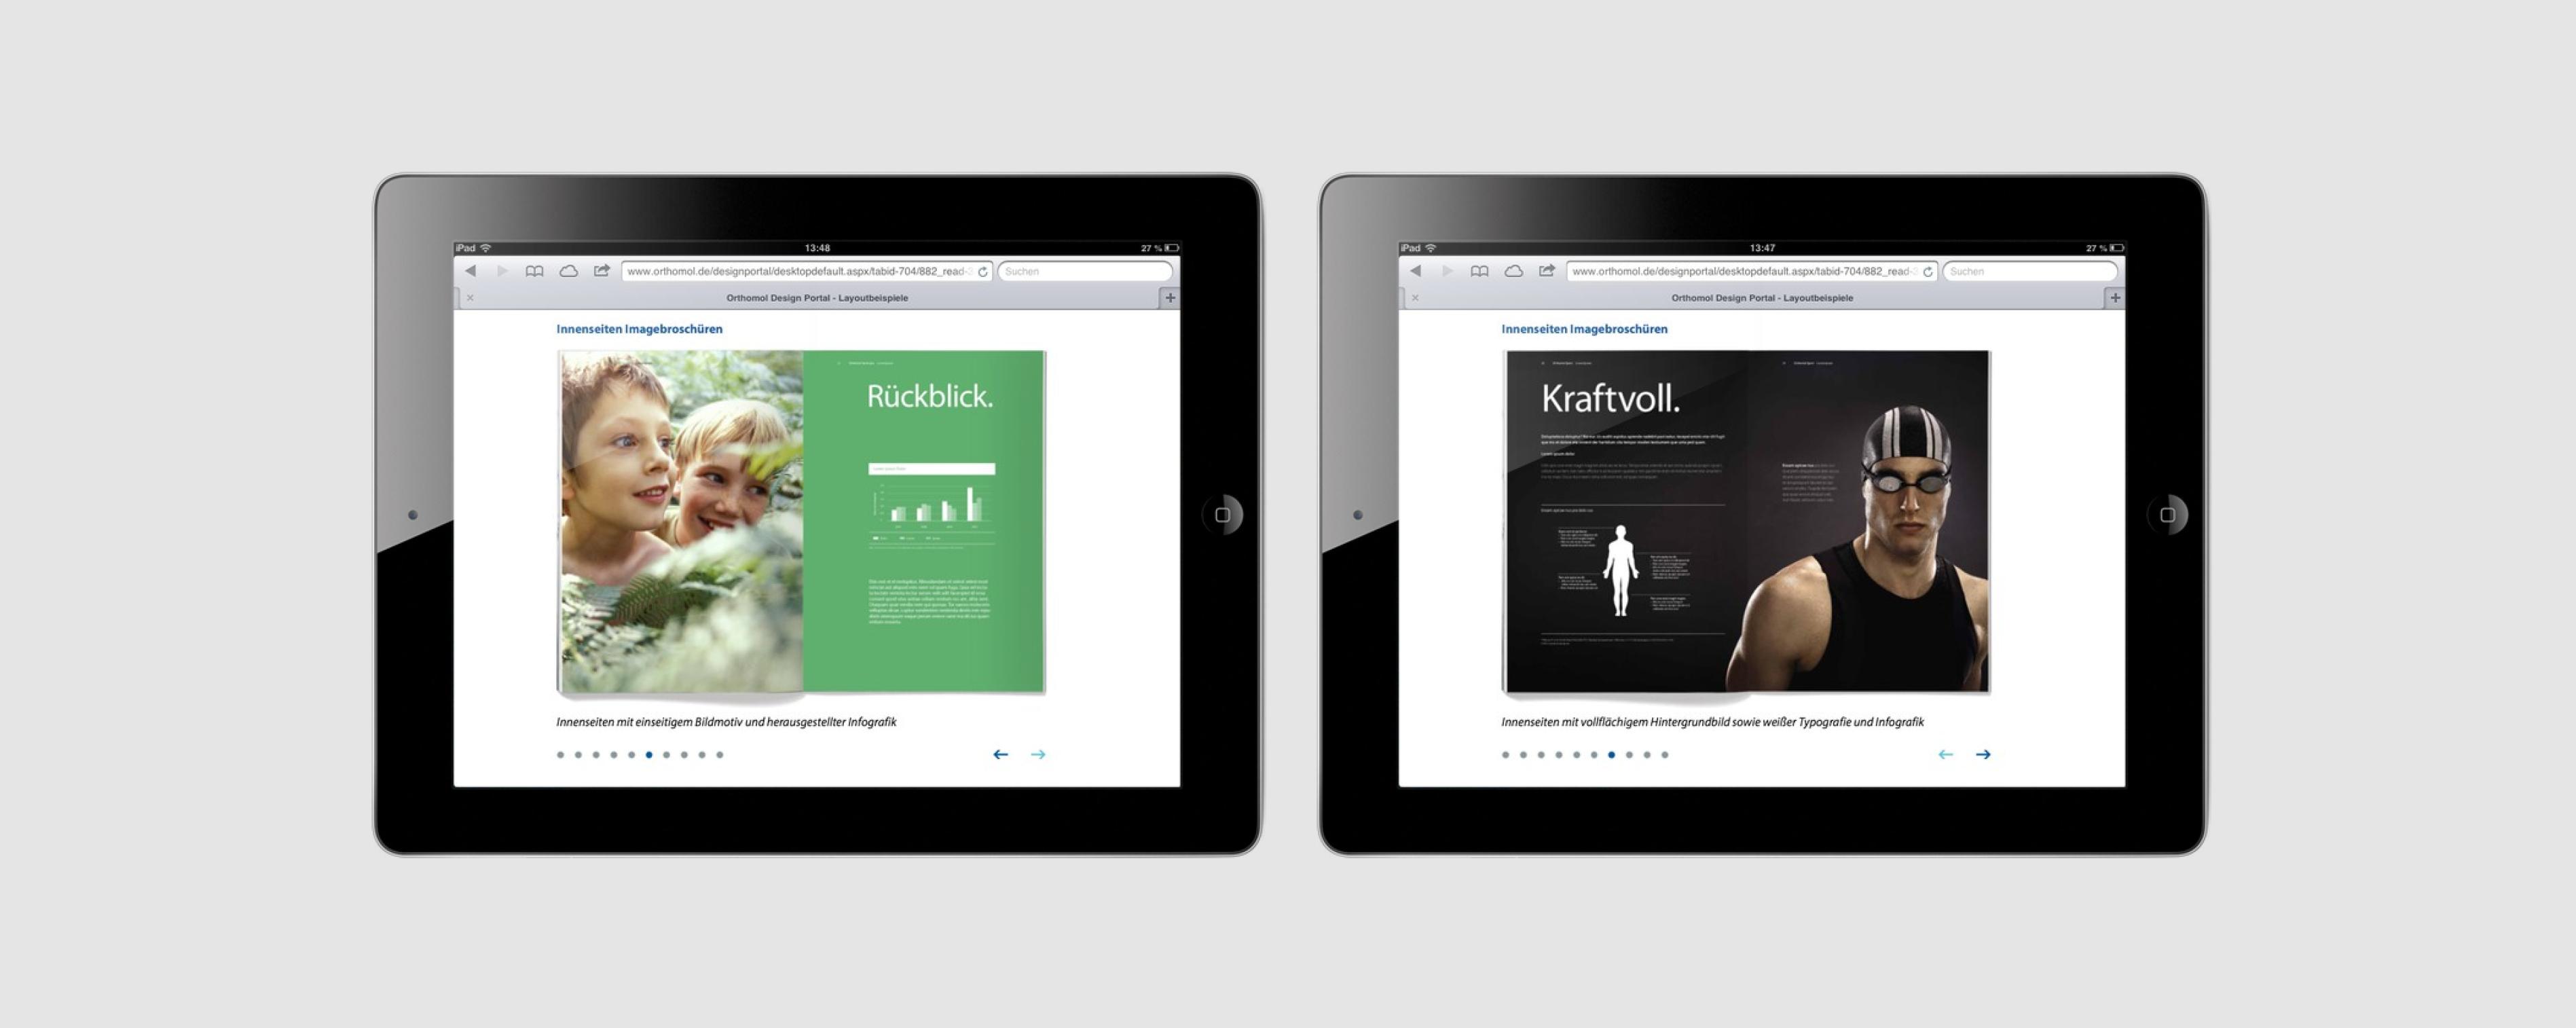 Orthomol – Poarangan Brand Design4